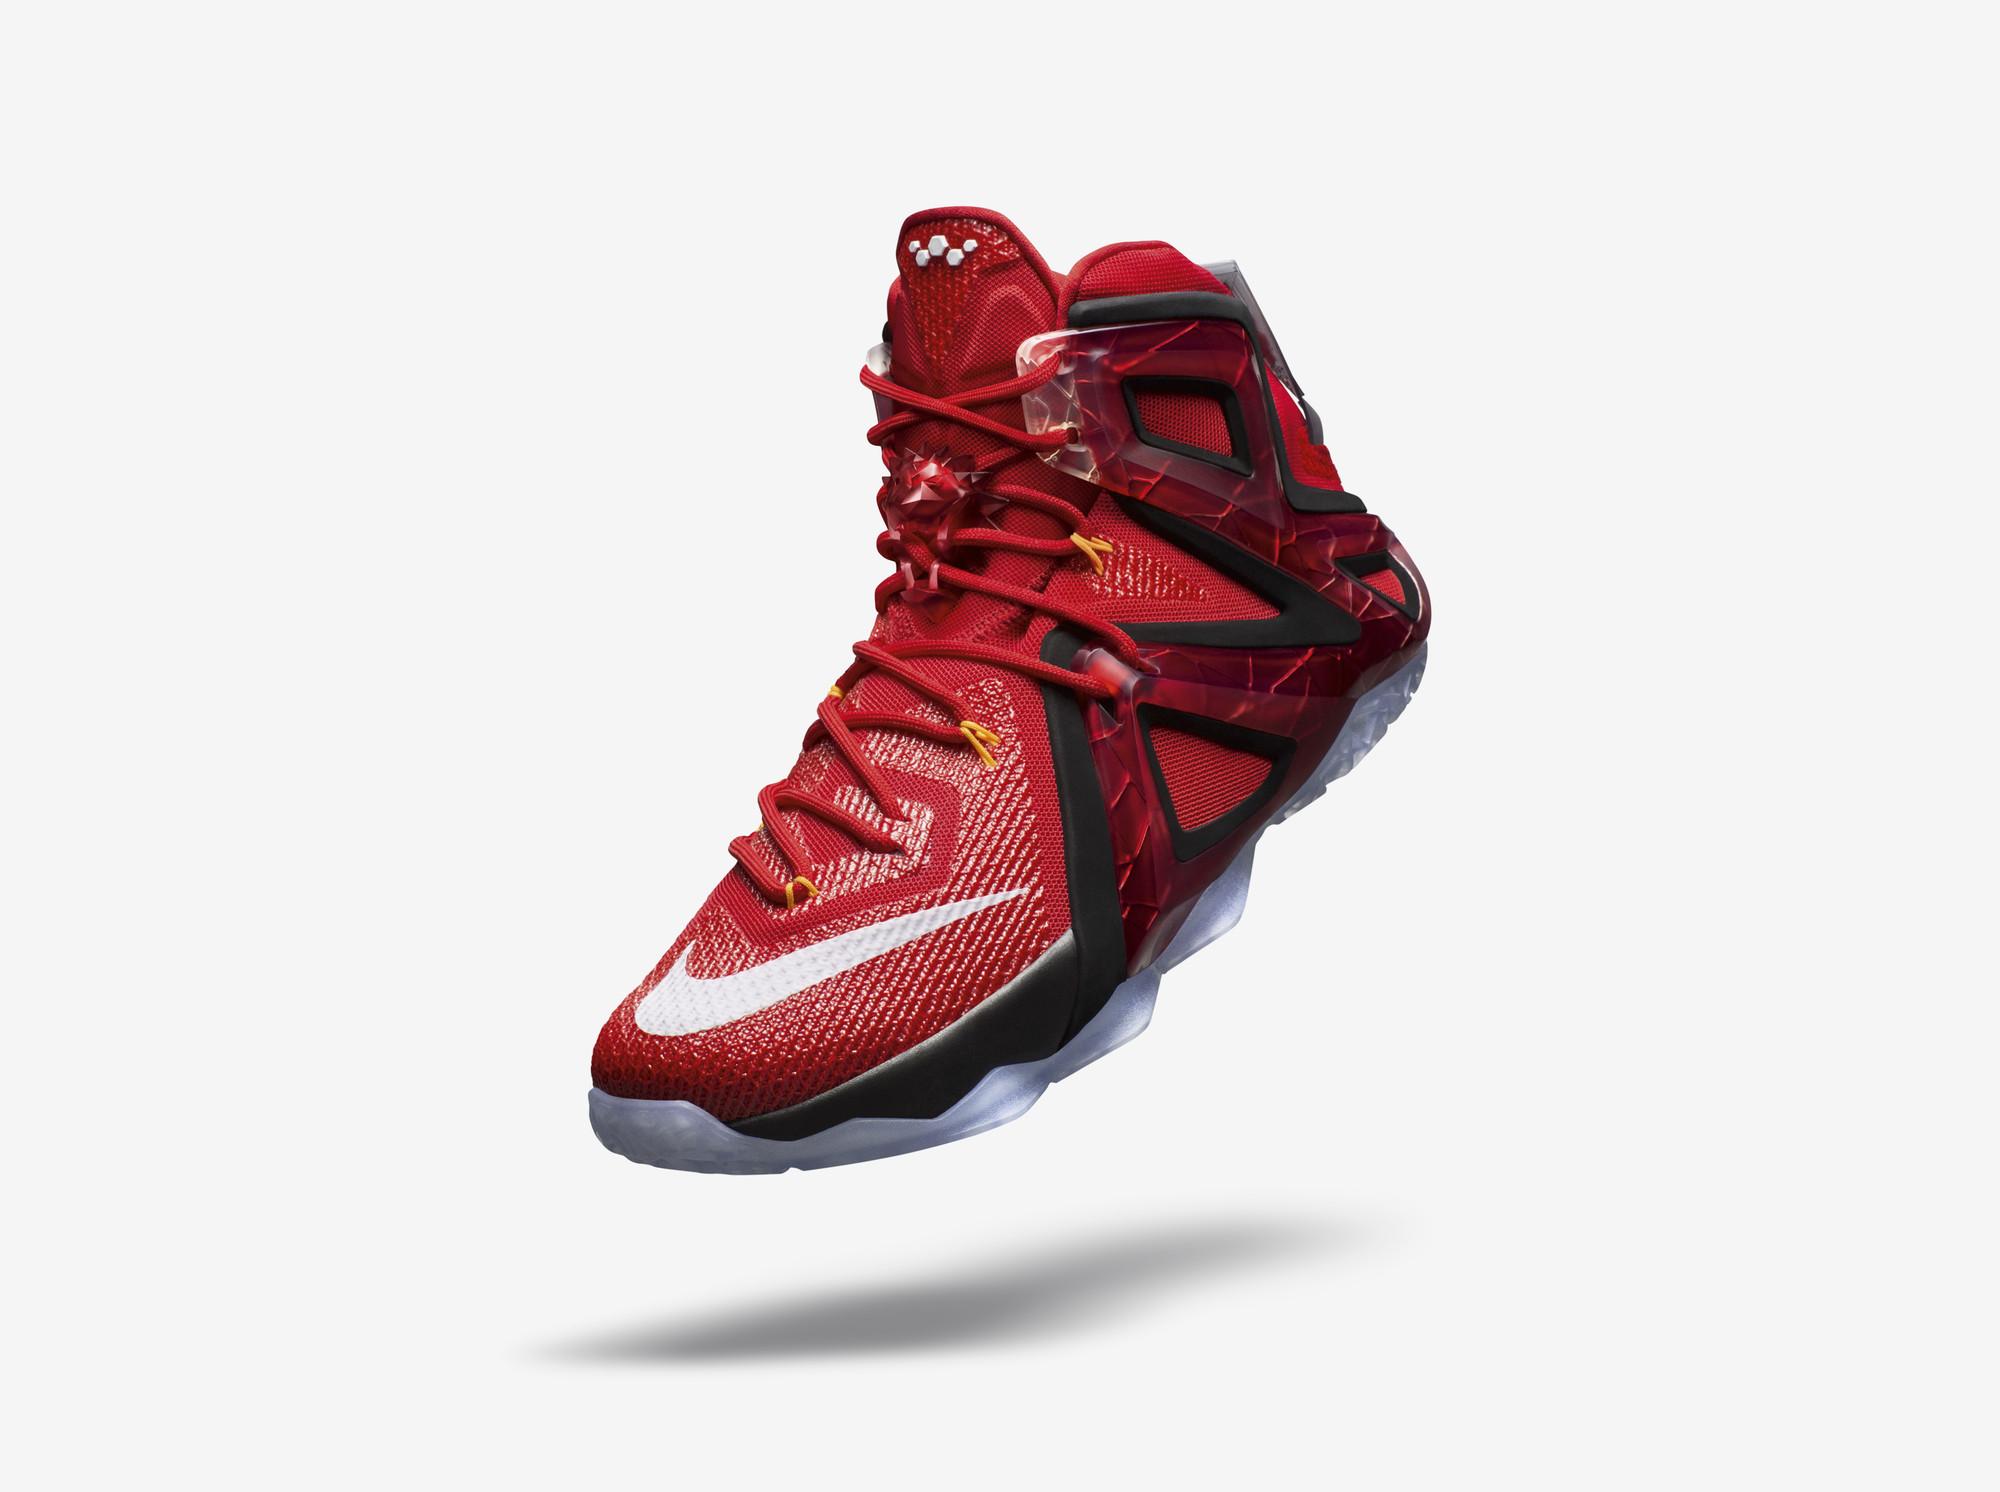 buy online c3b2d 0d035 Nike LeBron 12 Elite